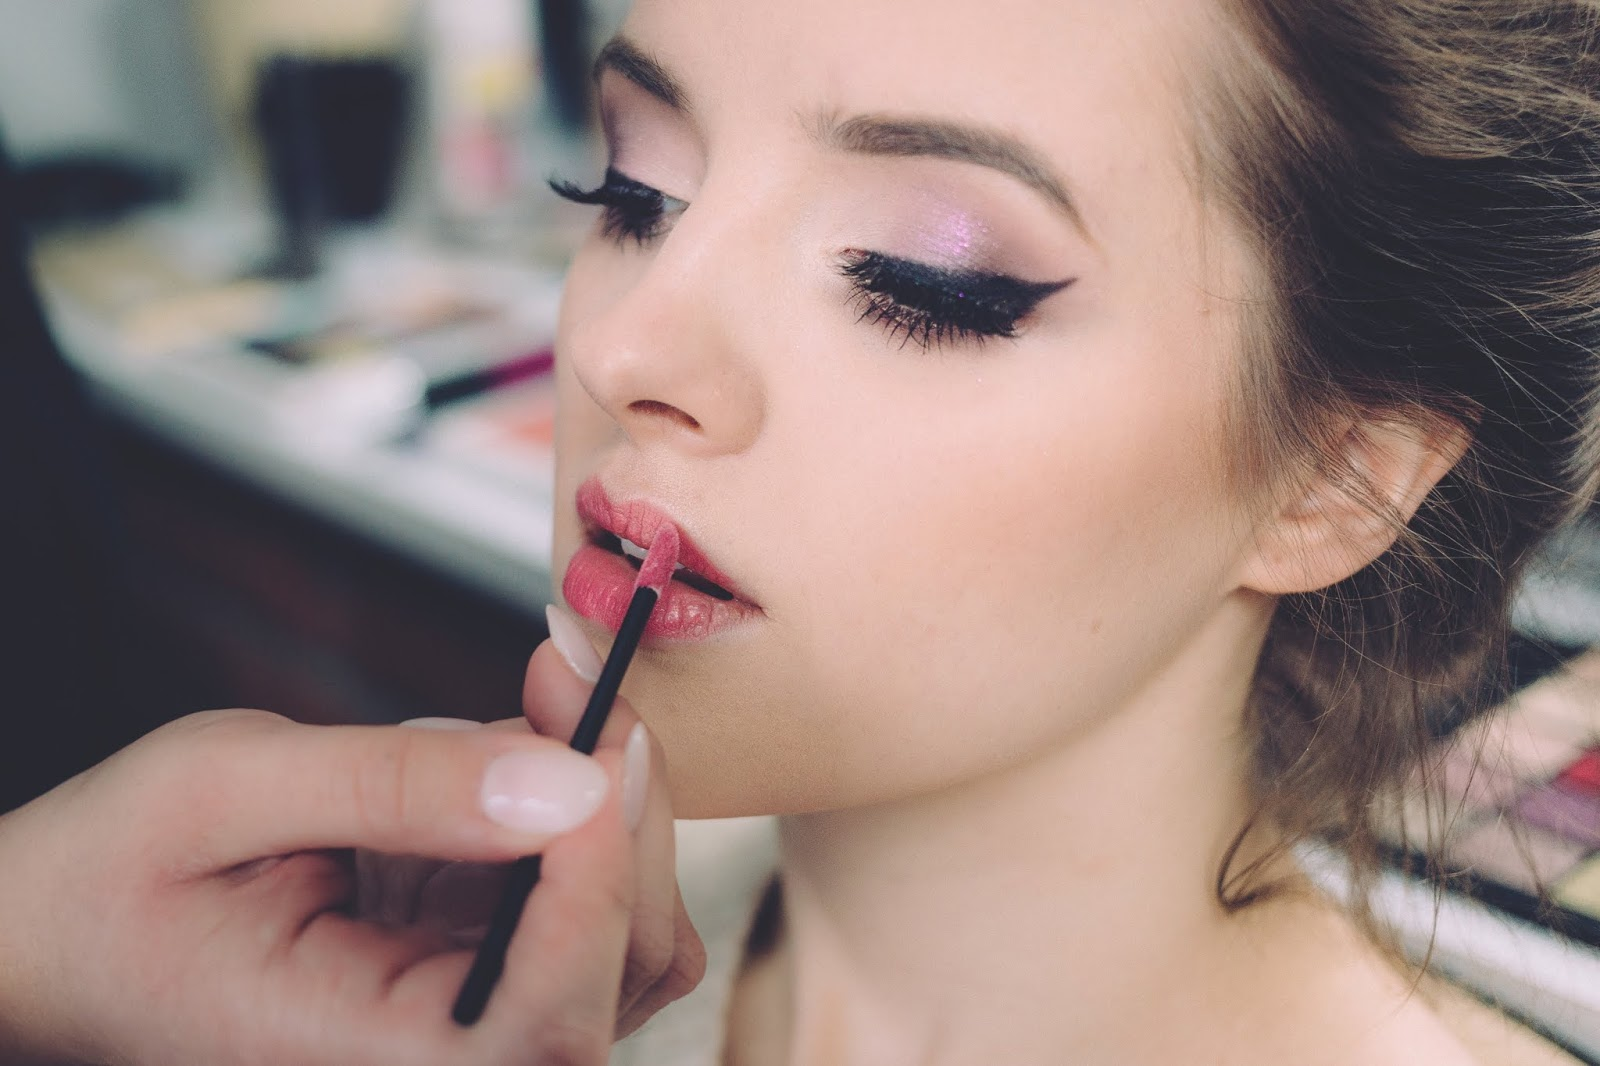 Beauty Tips | 4 Ways to Reach the Peak of Beauty